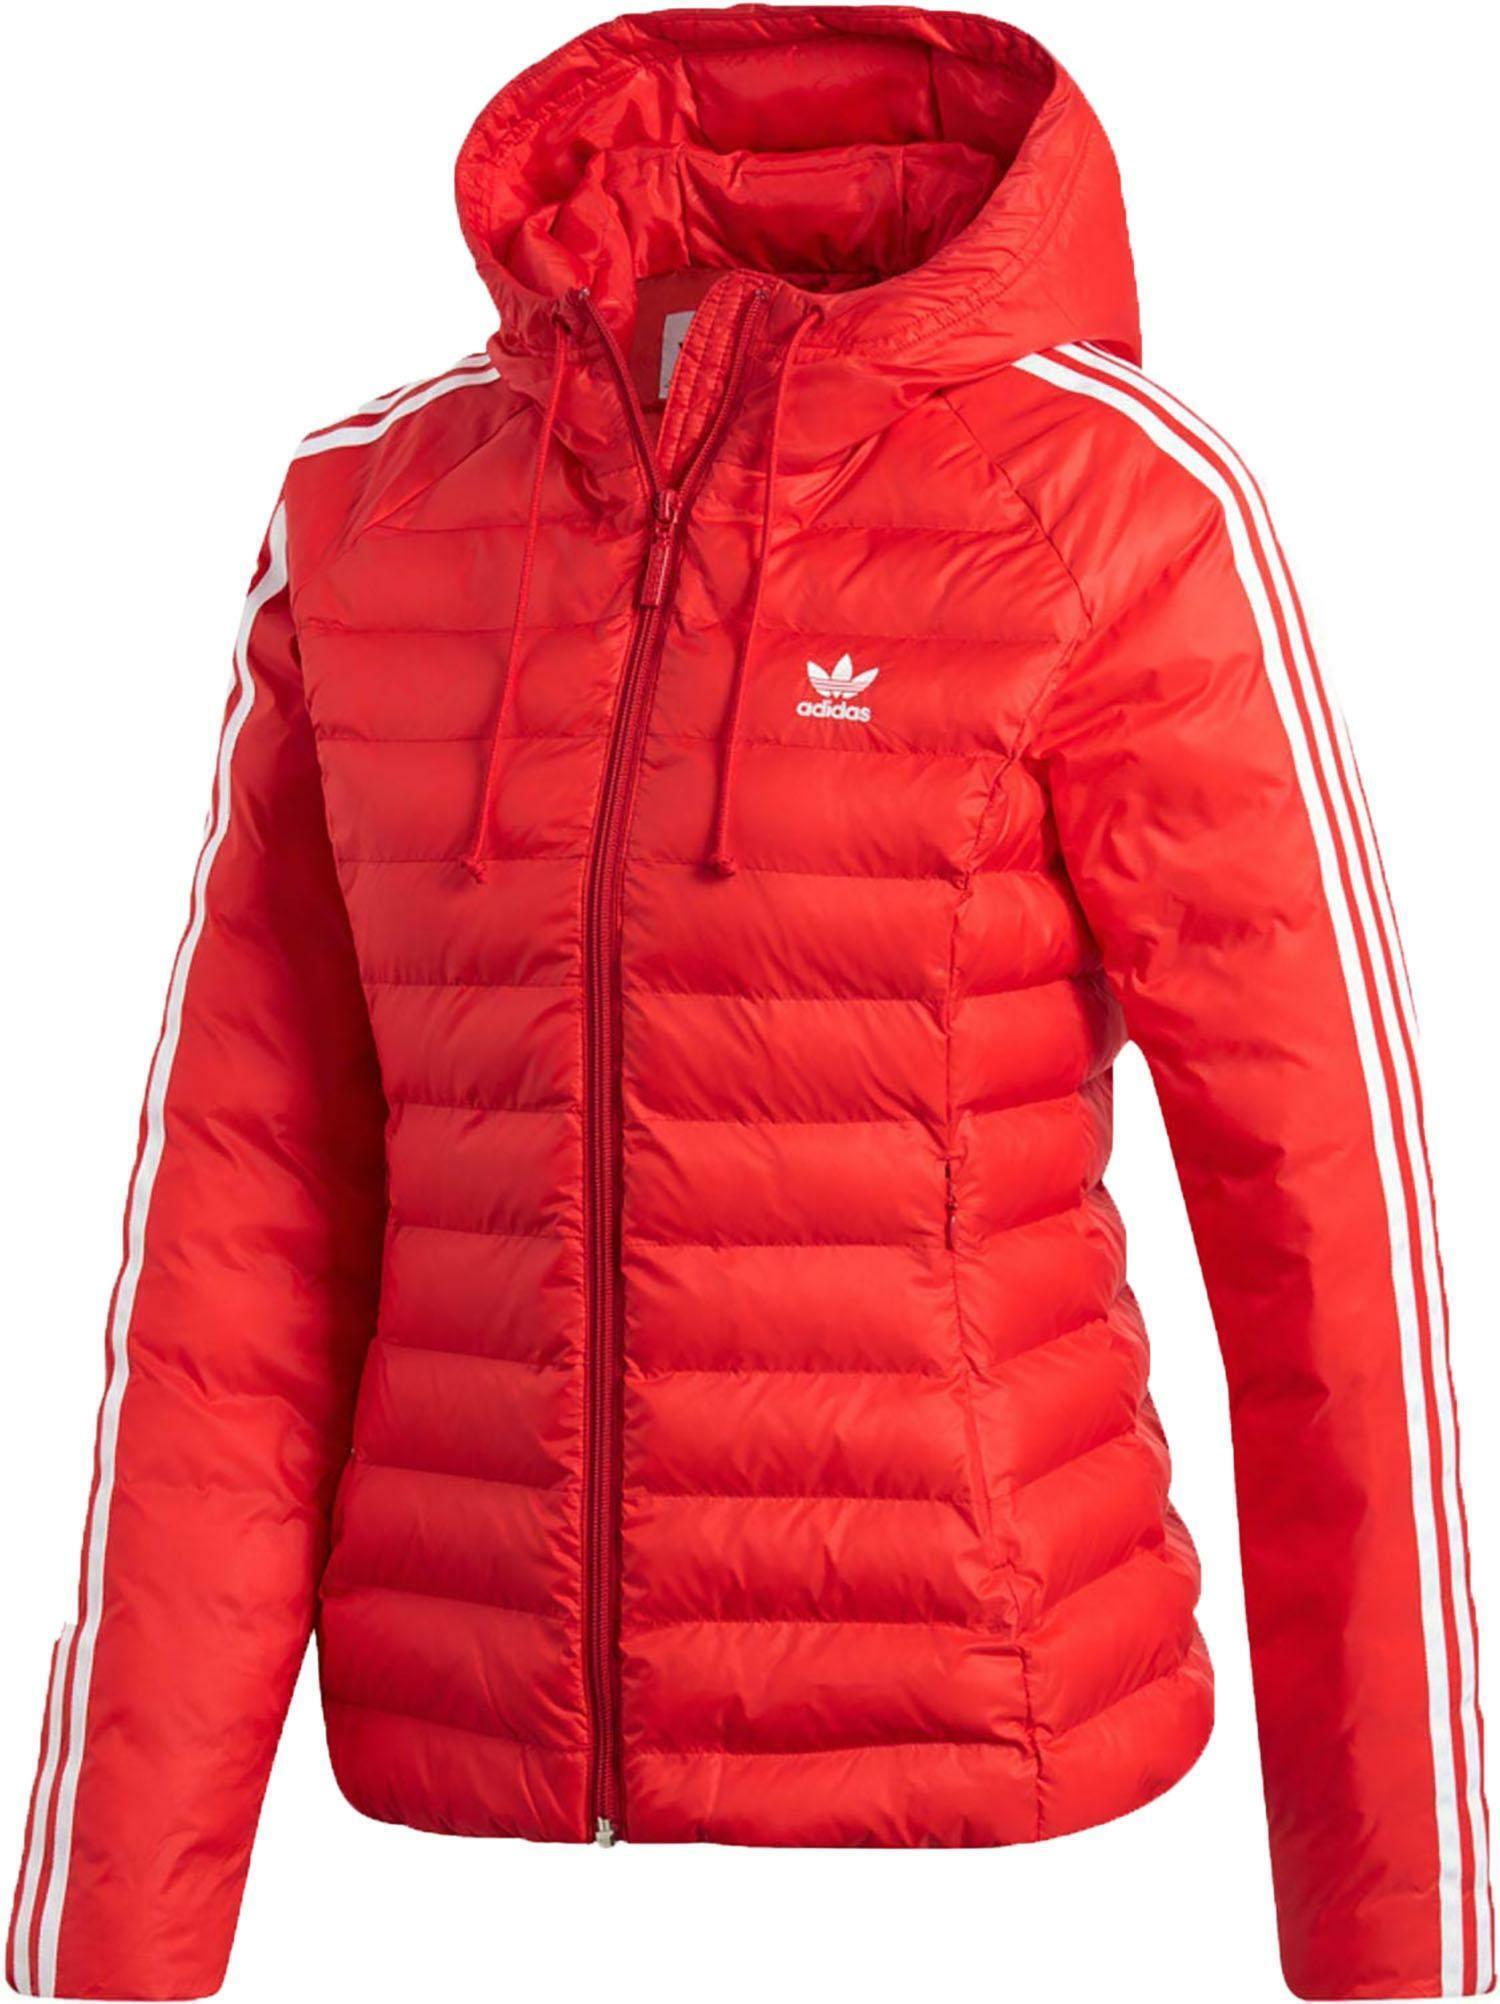 adidas veste femme rouge